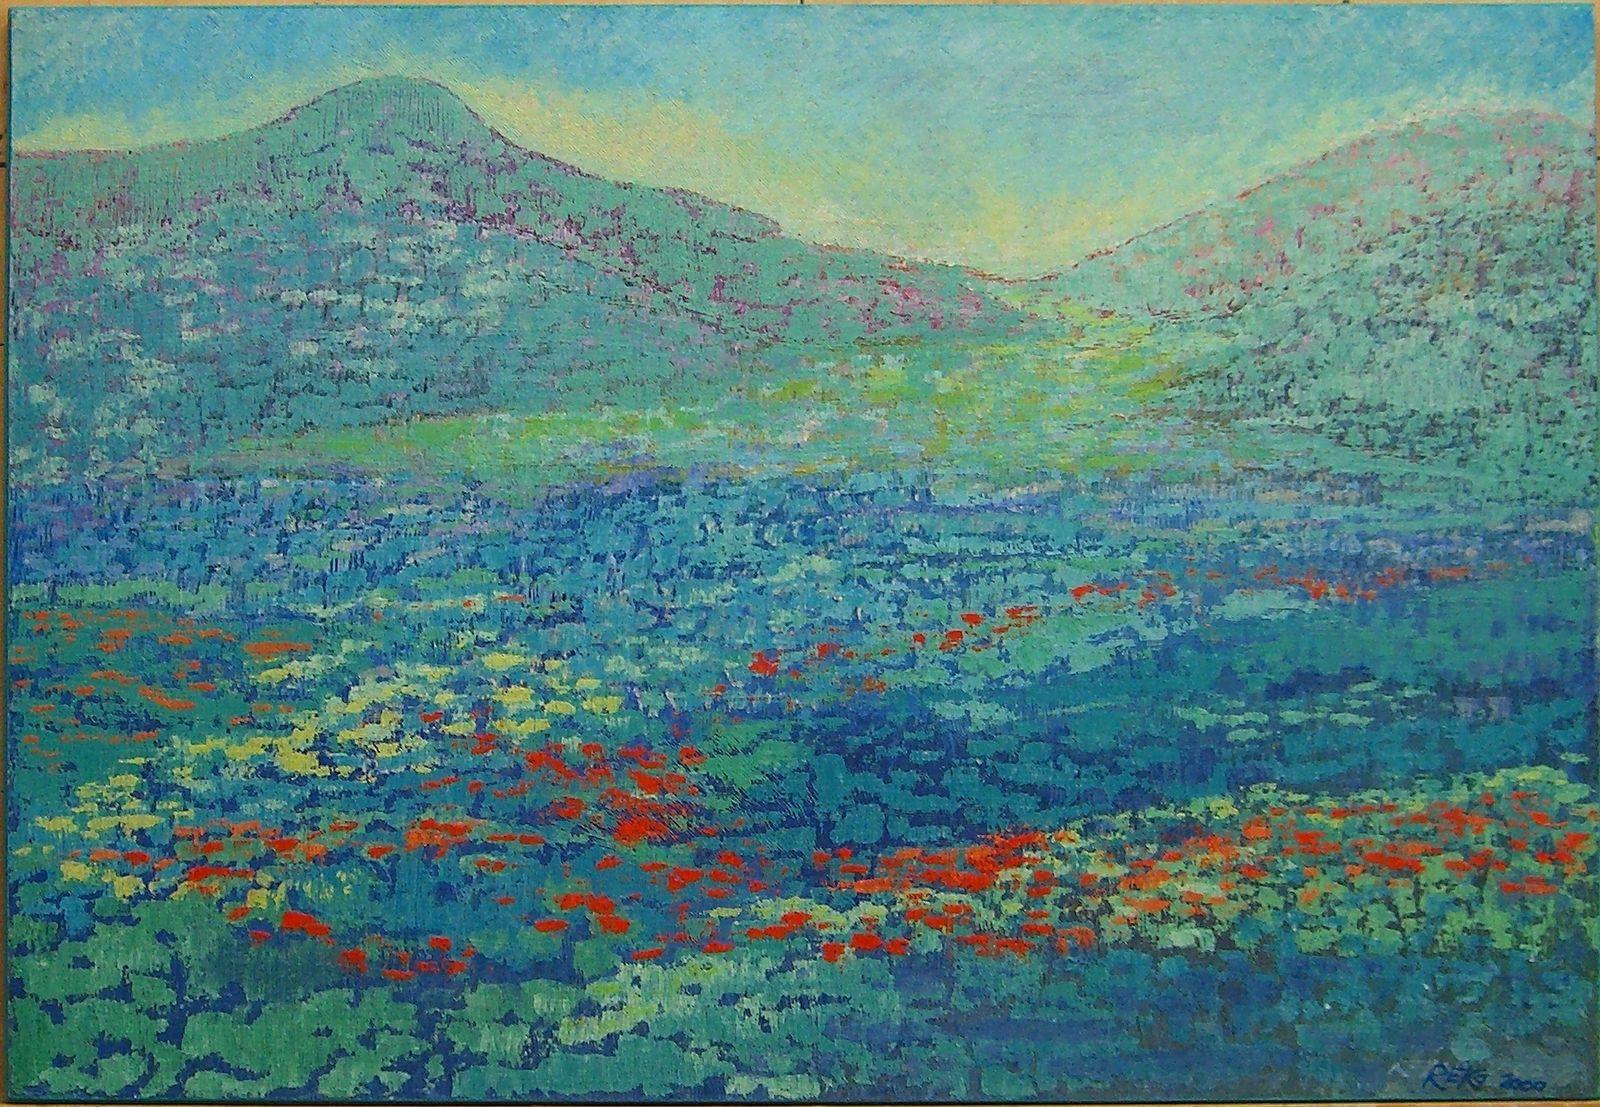 Virgin Natur, 2000, Ako-Spachtel, 44x64 cm